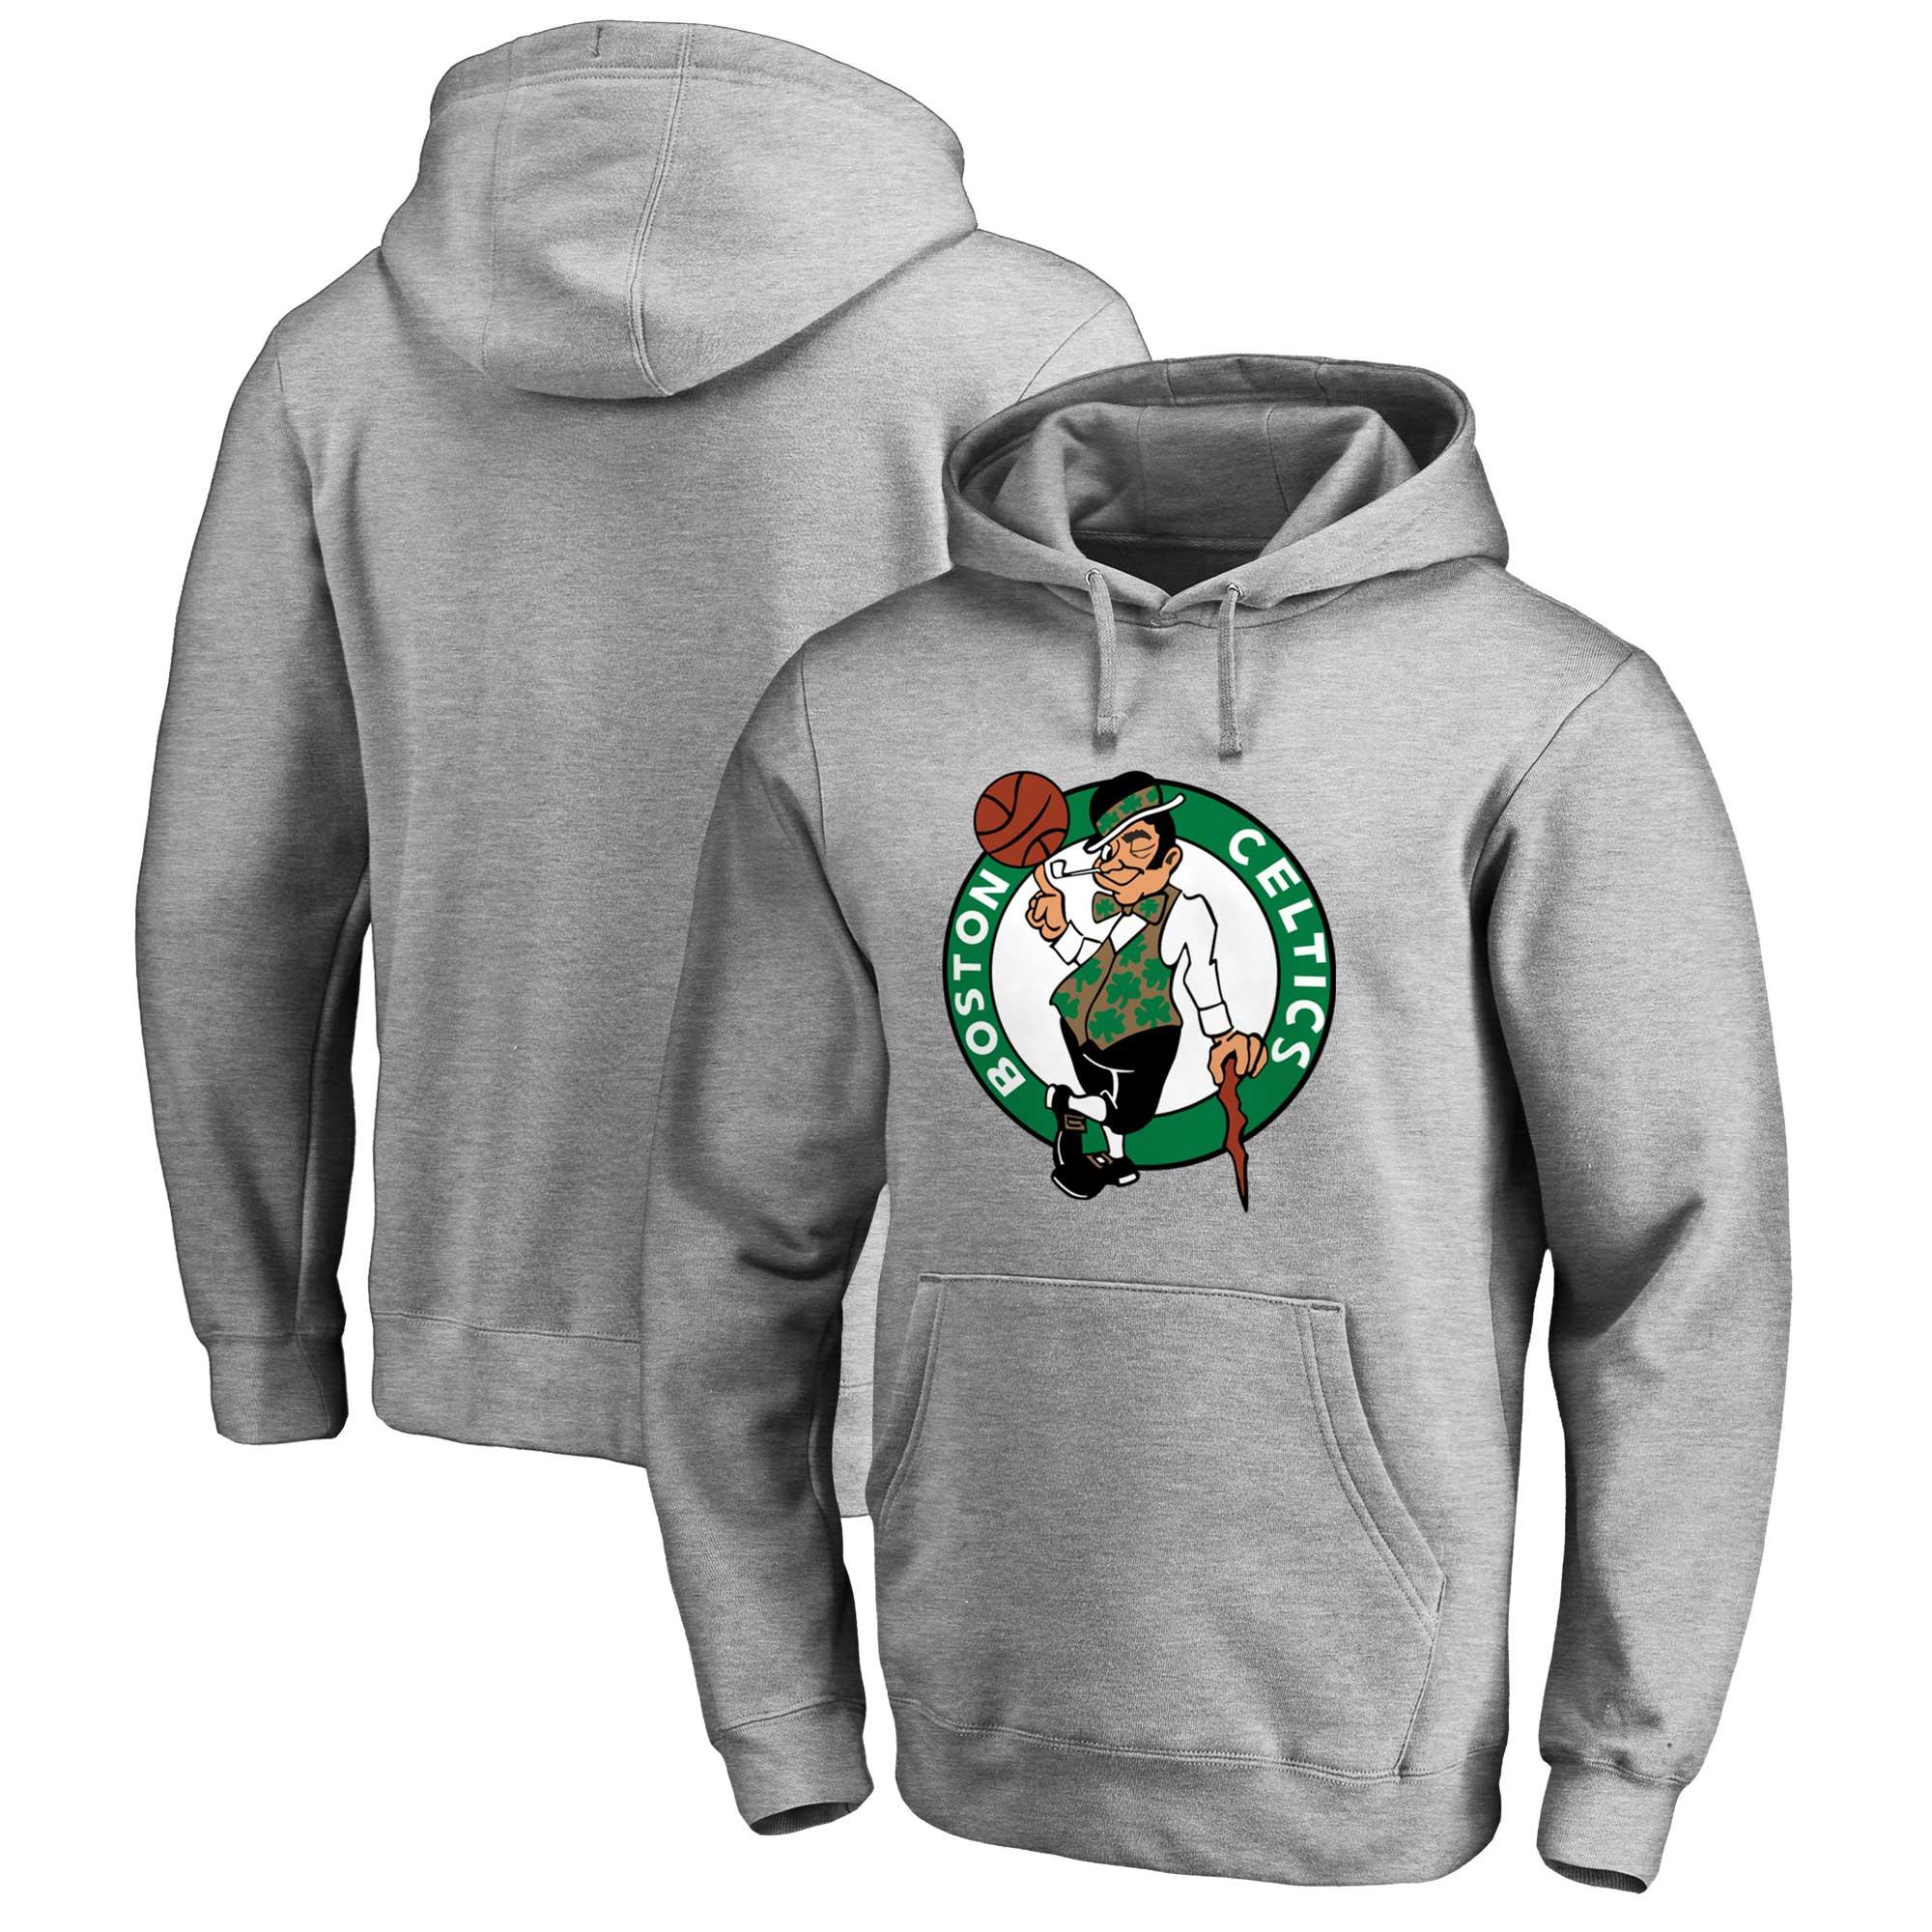 Boston Celtics Fanatics Branded Primary Logo Pullover Hoodie - Heathered Gray